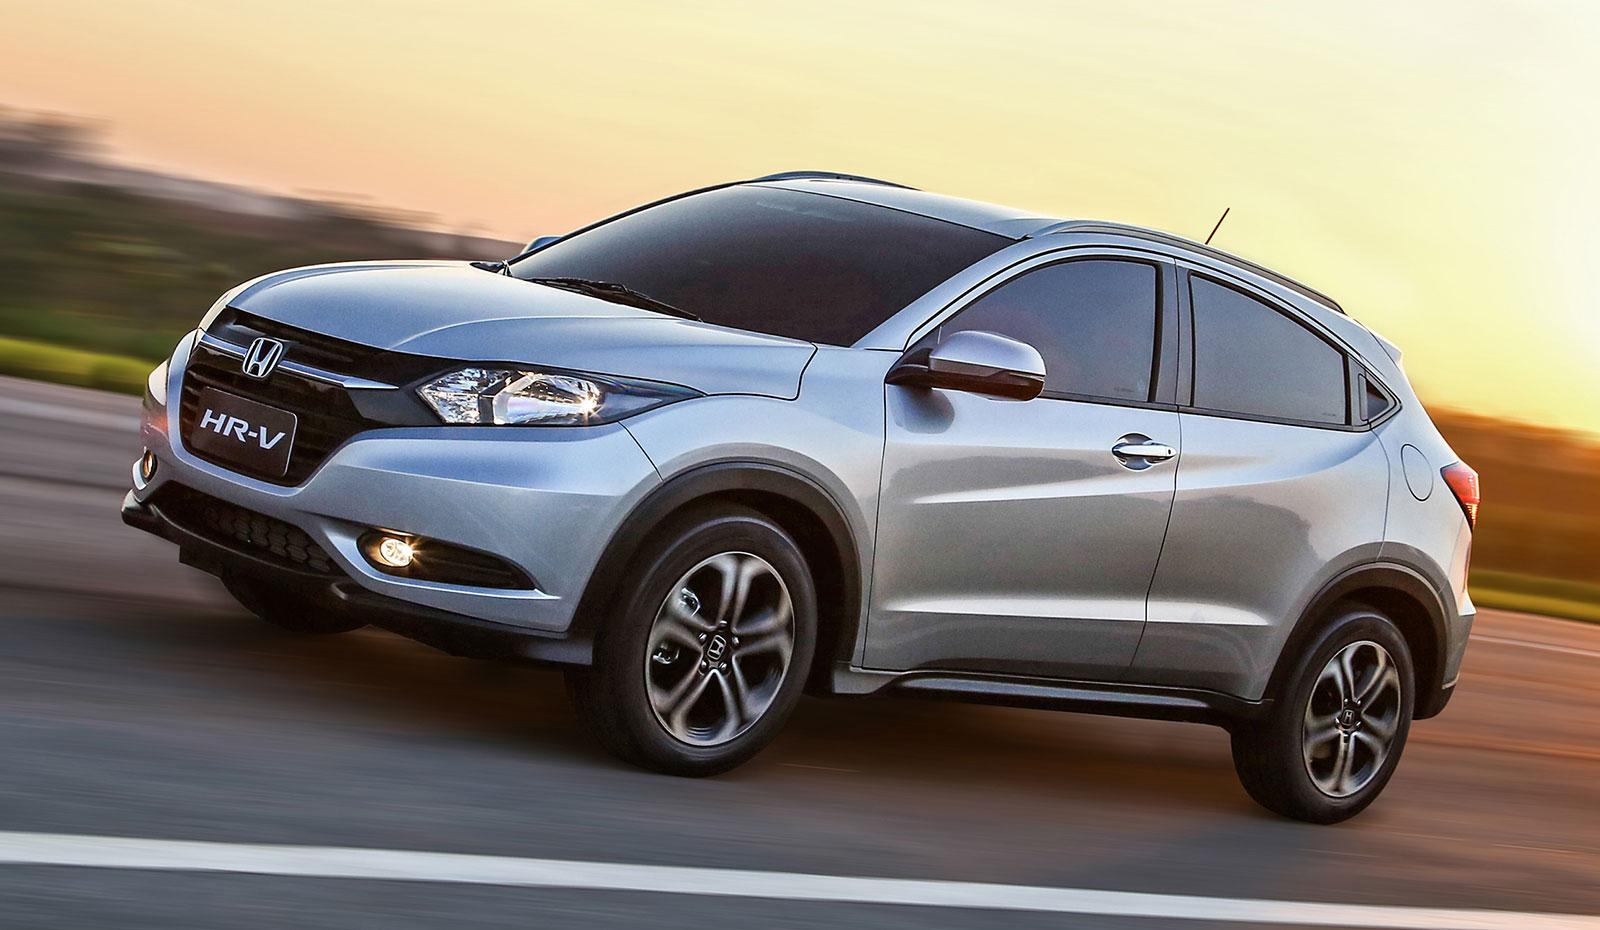 Kelebihan Kekurangan Harga Mobil Honda Bekas Review